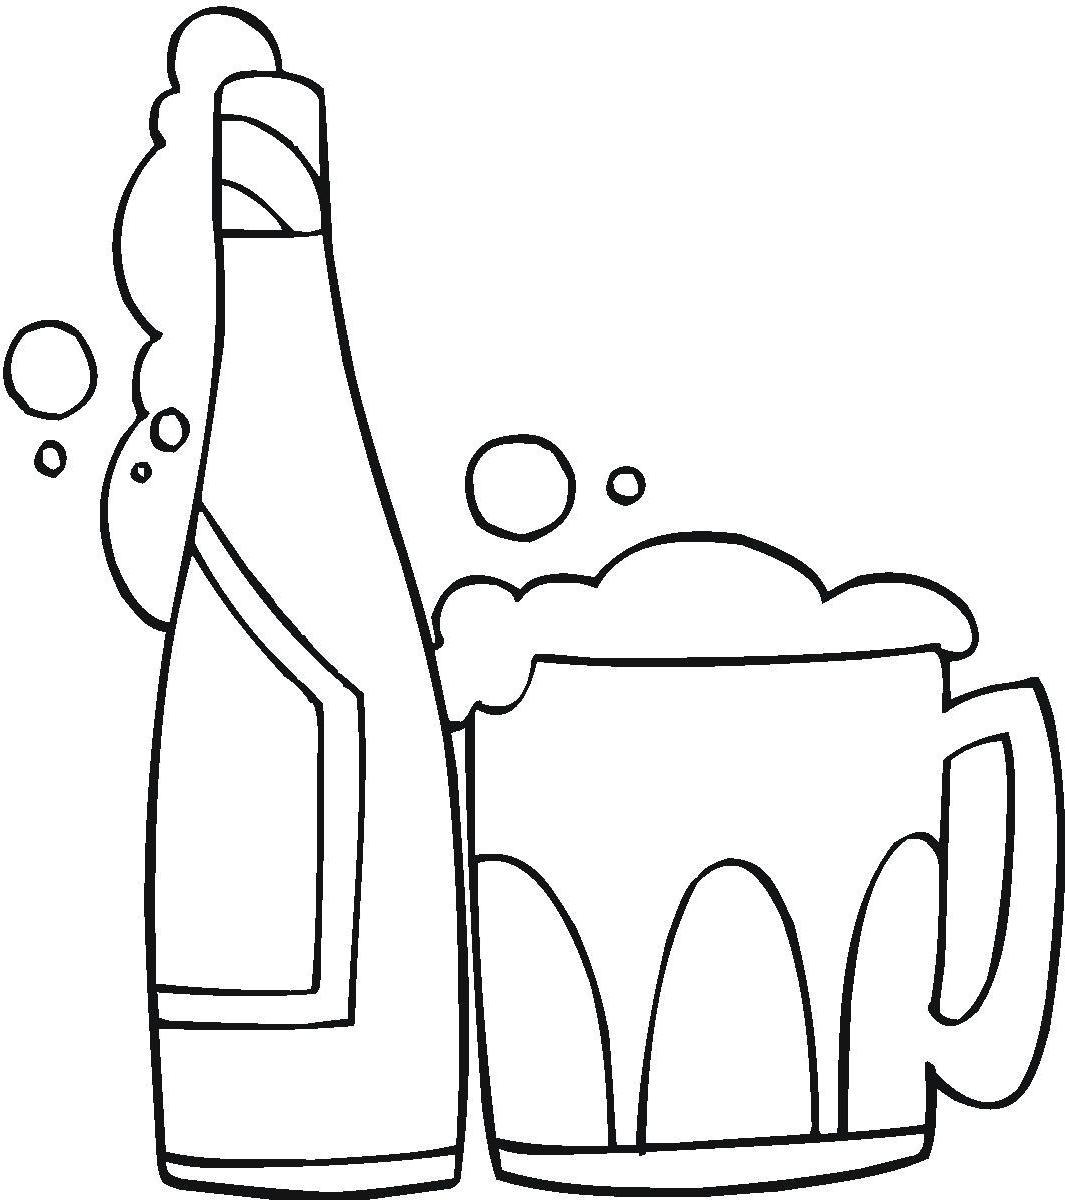 Alcohol clipart black clip art library download Alcohol clipart black and white 2 » Clipart Station clip art library download